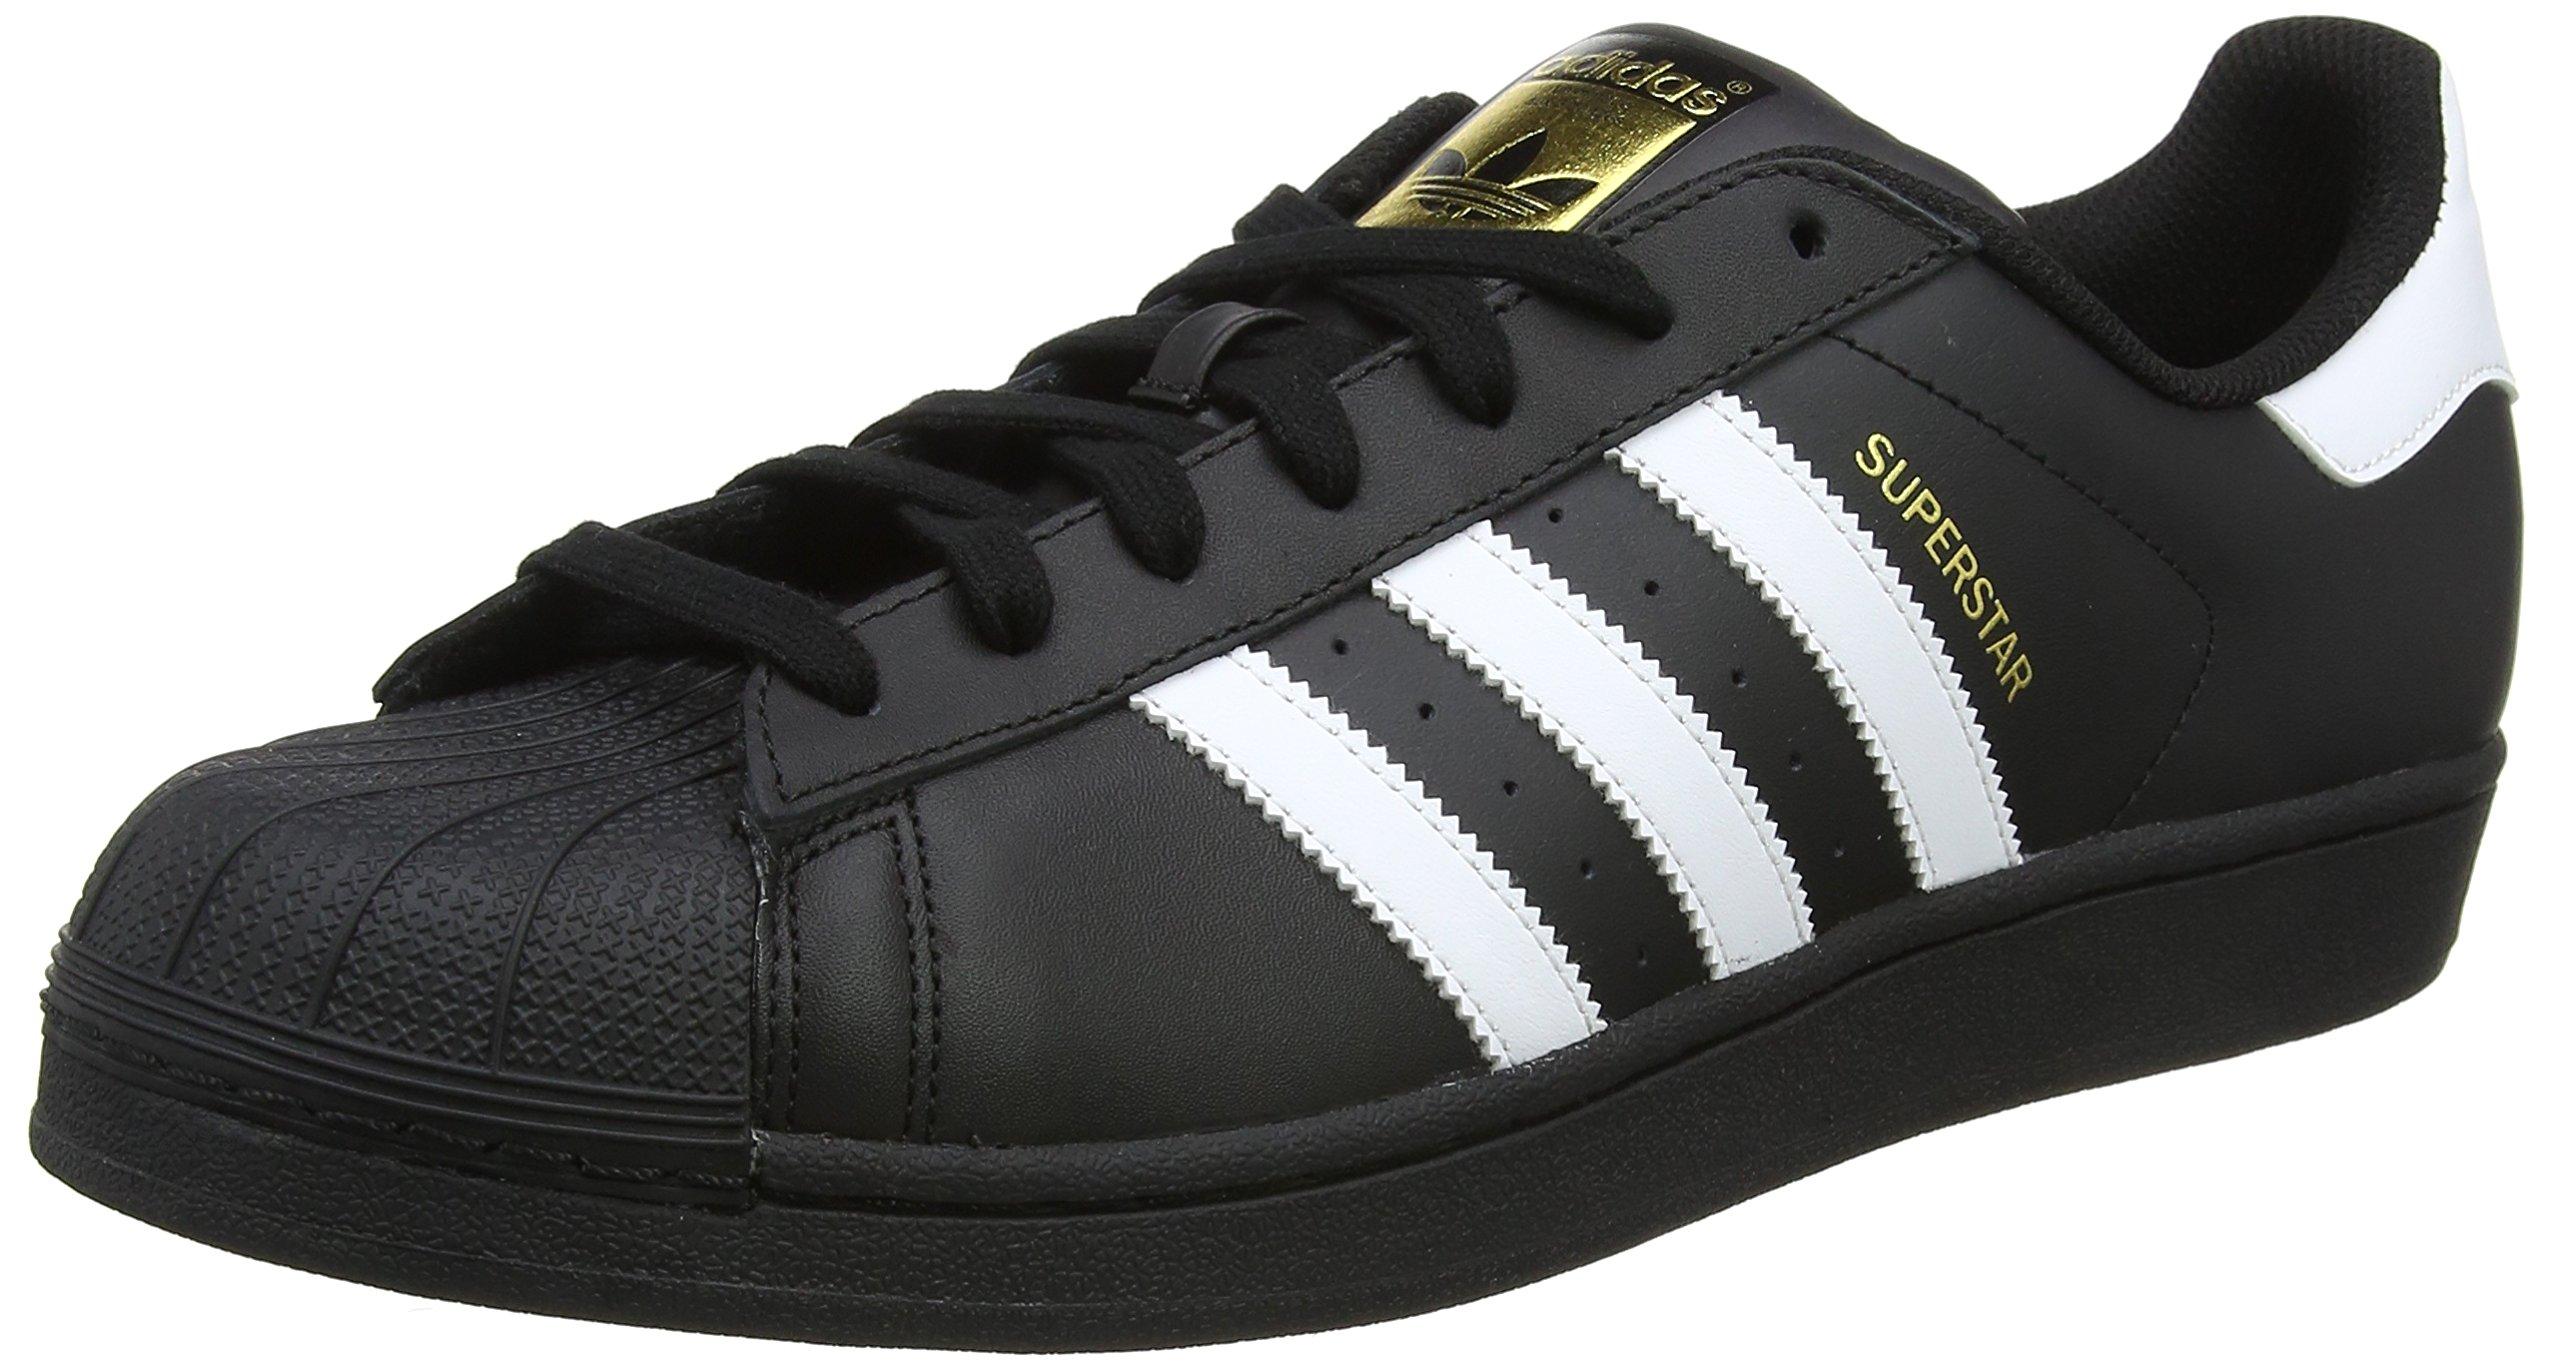 Adidas Originals Superstar Foundation Scarpe da Ginnastica Unisex - Adulto 1 spesavip